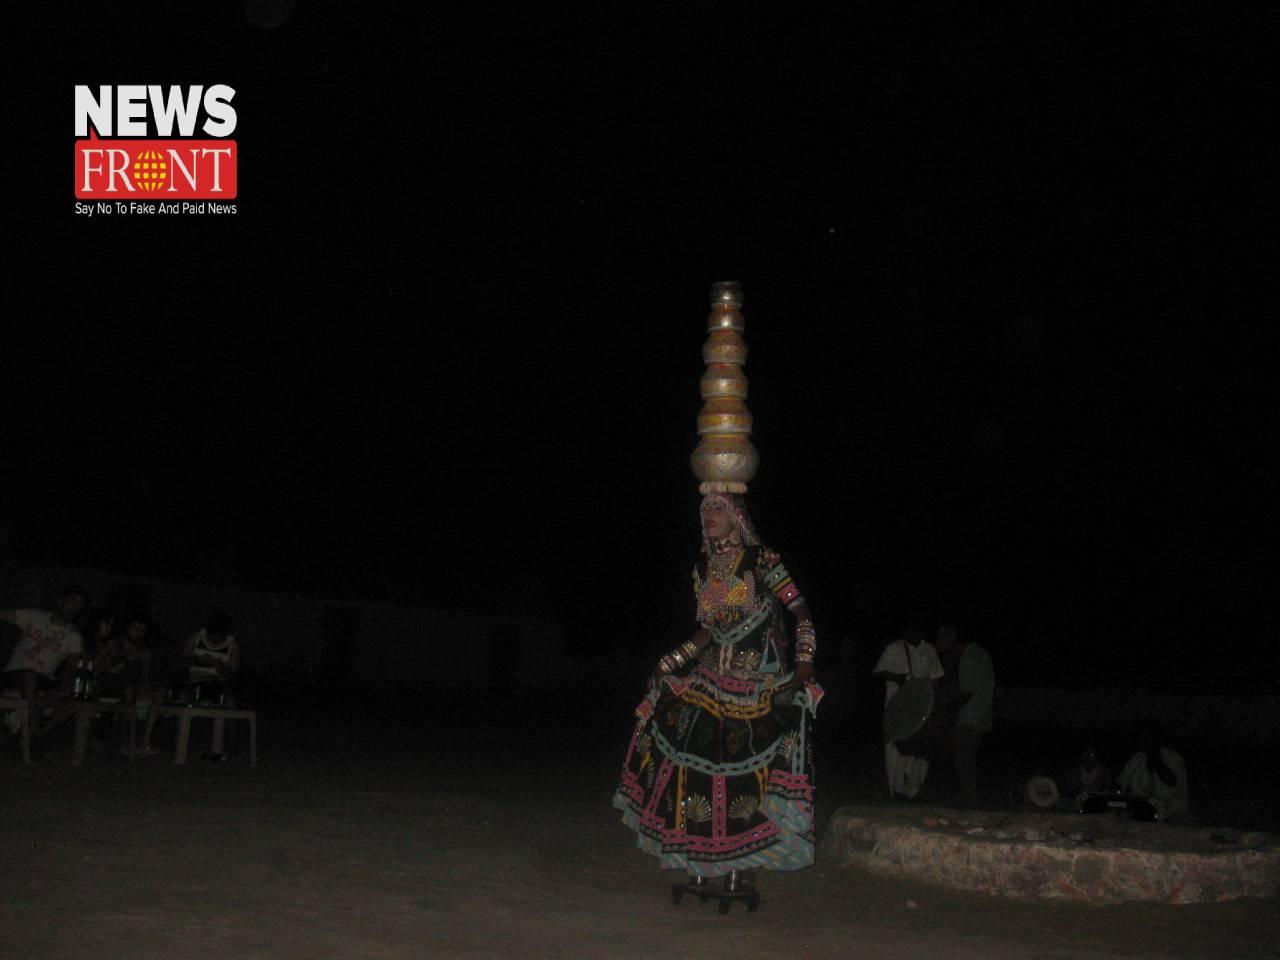 balanced dance | newsfront.co